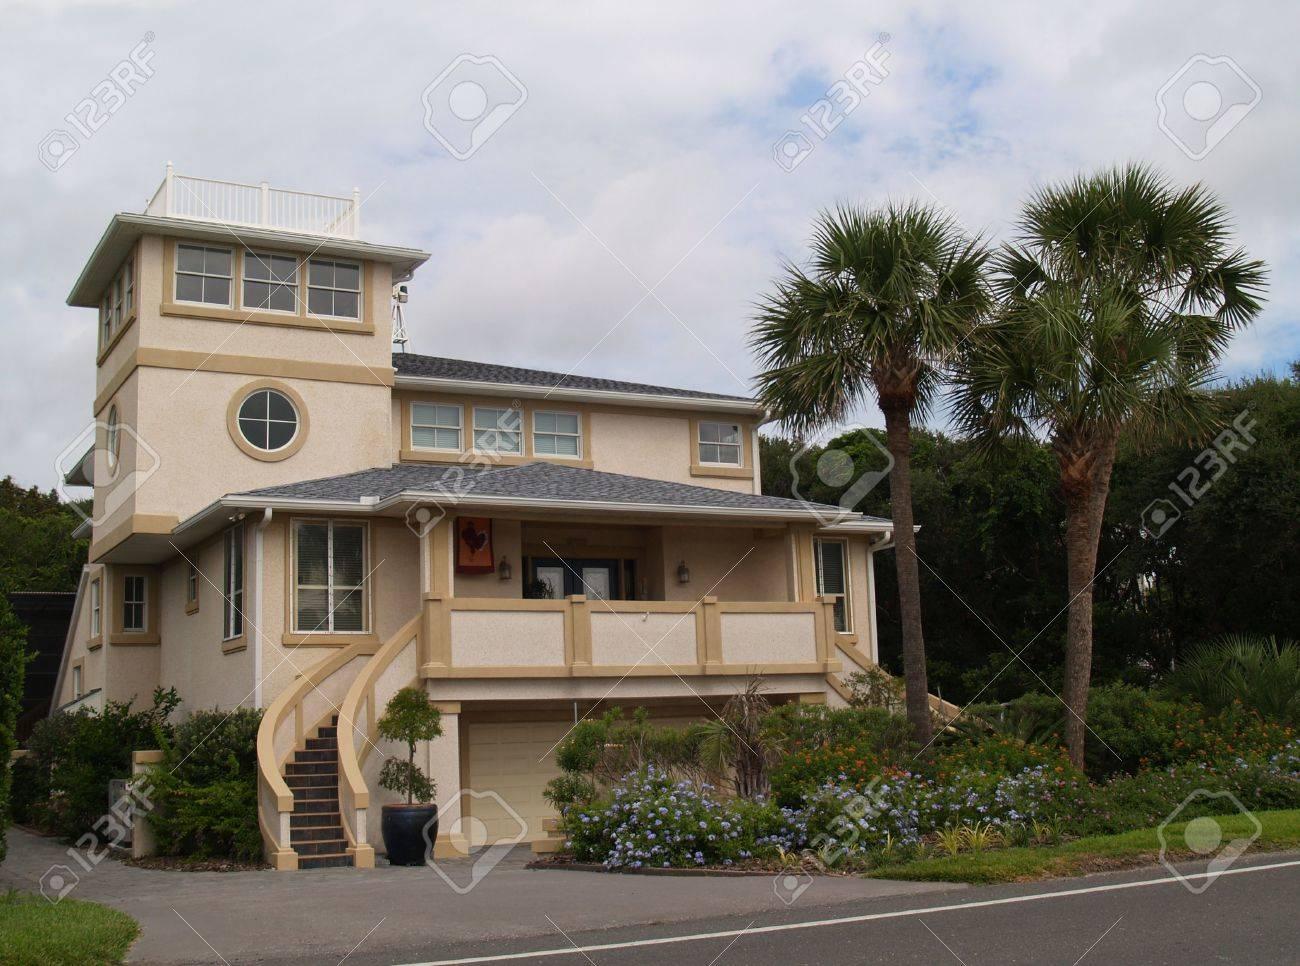 Three story beach house found in Florida. - 5520091